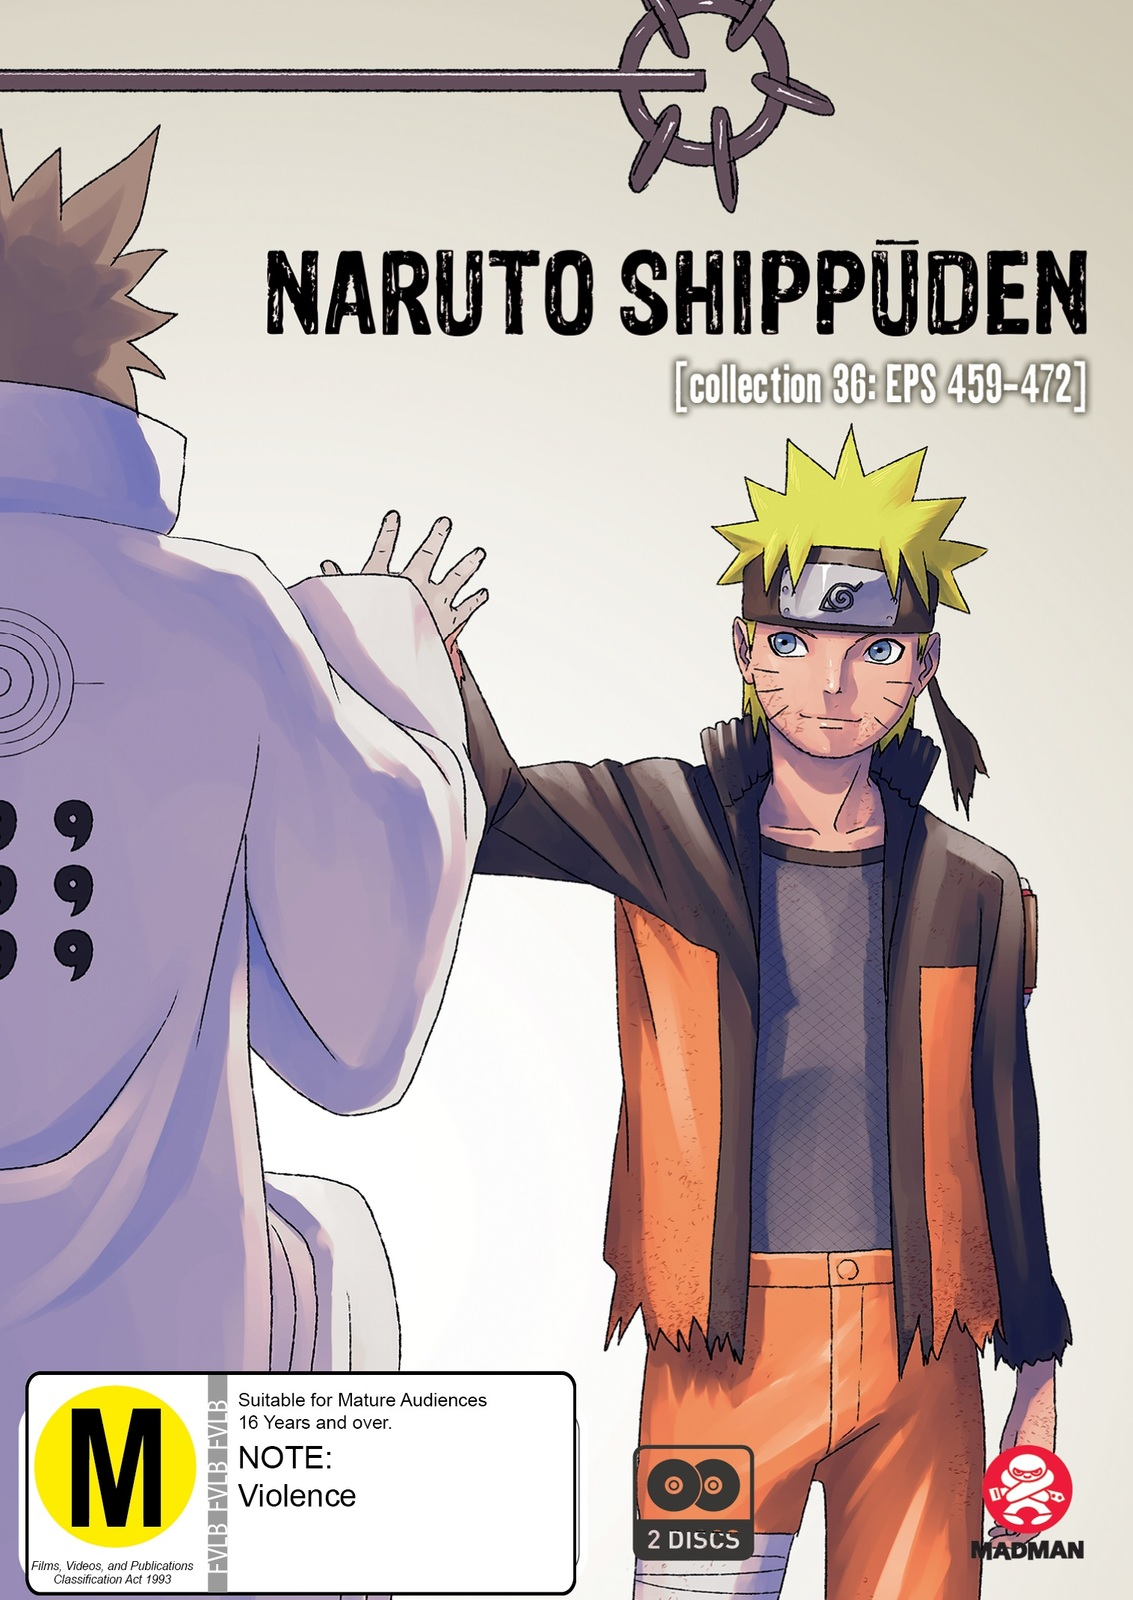 Naruto Shippuden: Collection 36 (eps 459-472) on DVD image